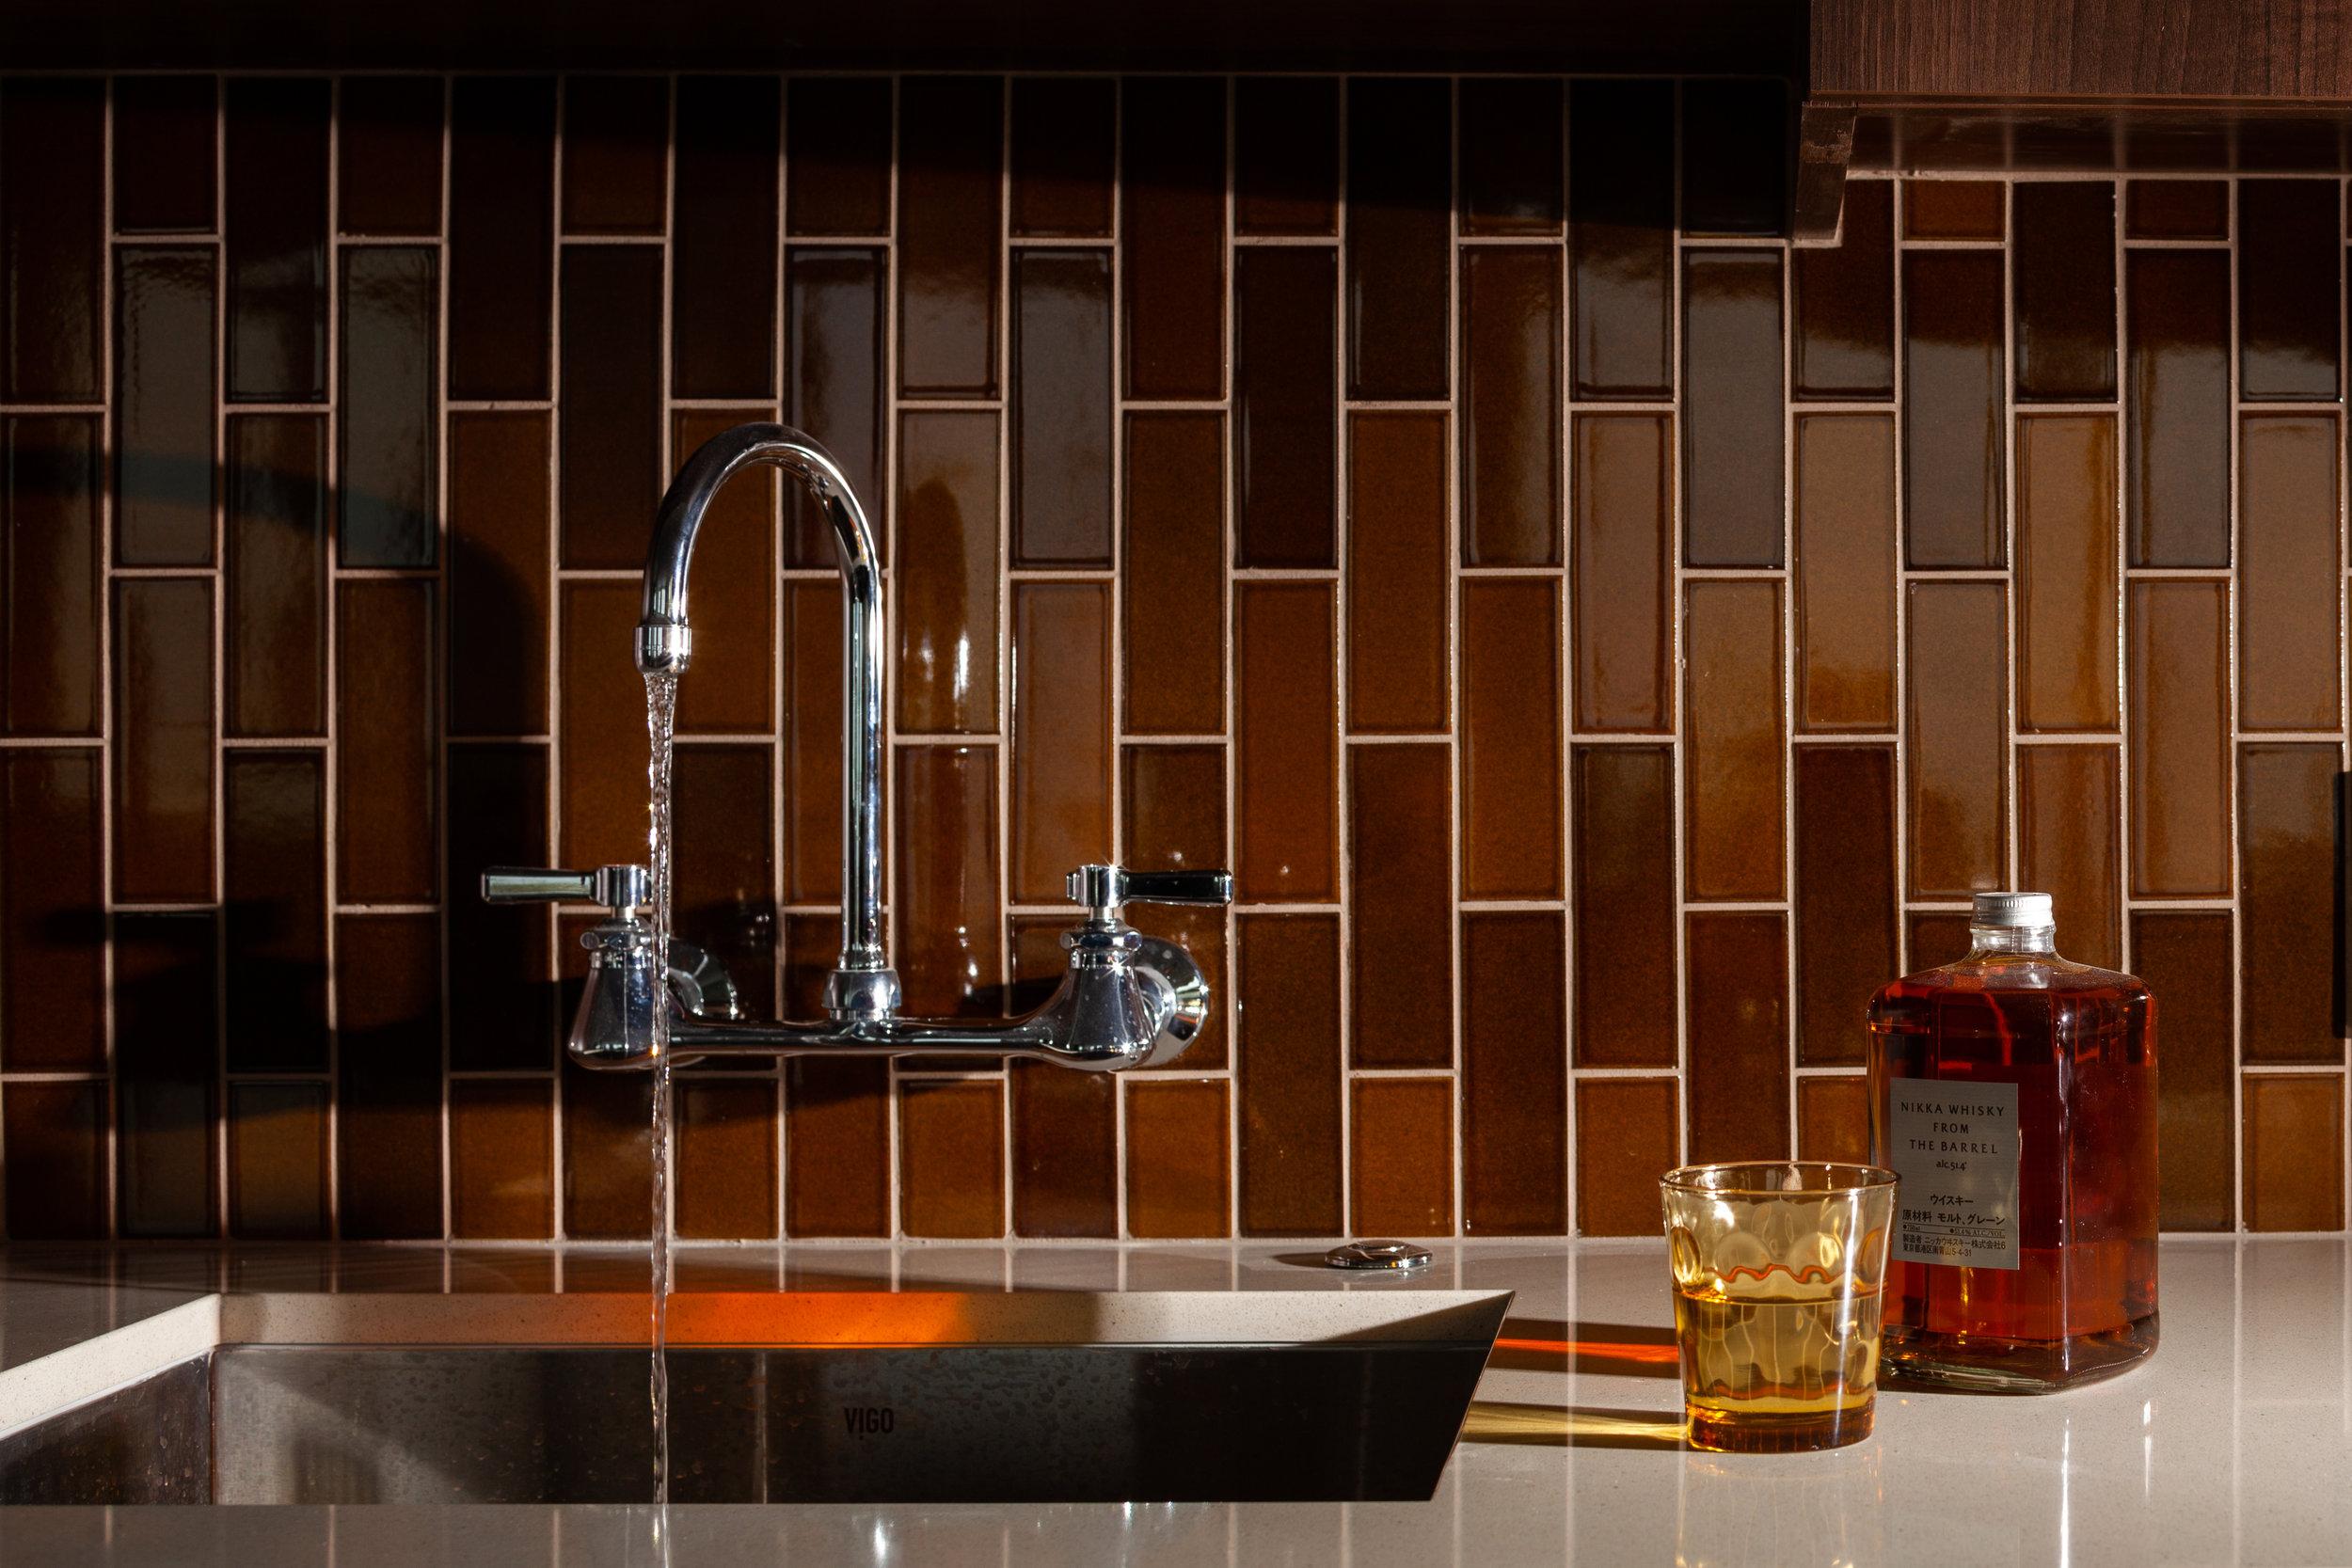 The design details in the kitchen showcase the clients' unique style.